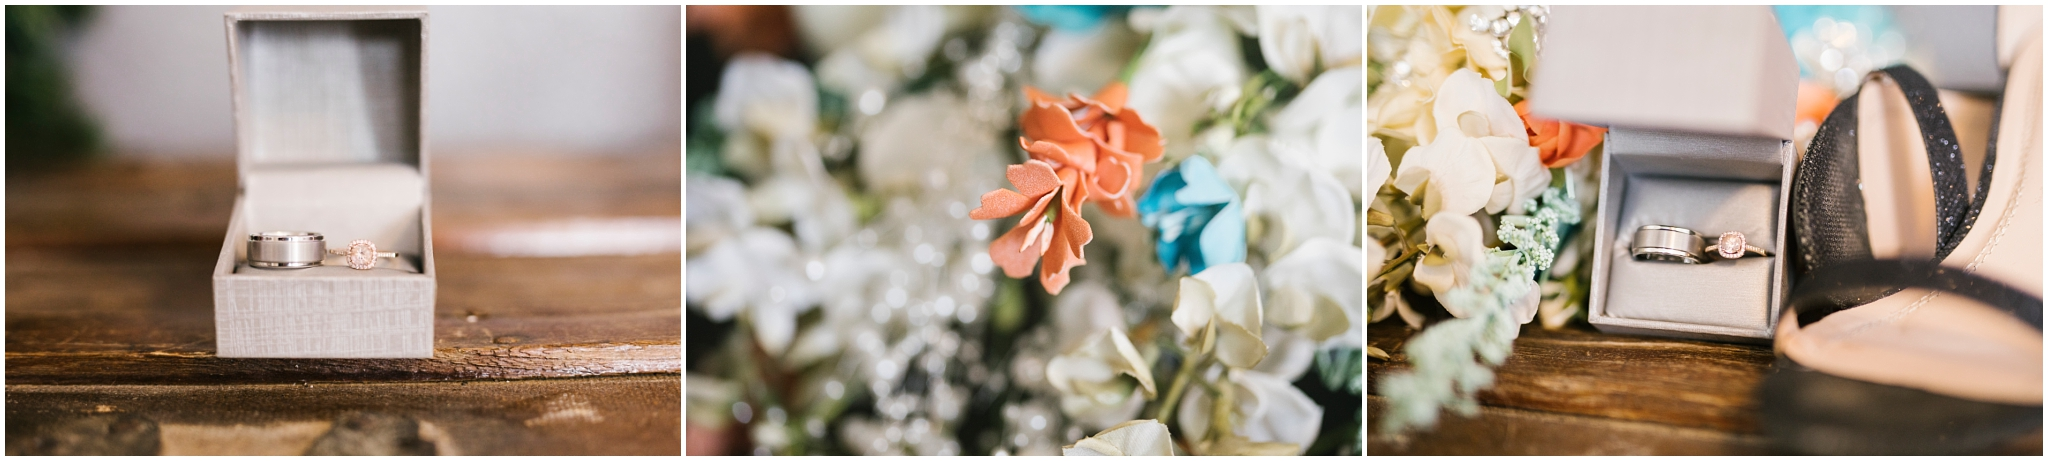 Bo Alyssa Wedding-18_Lizzie-B-Imagery-Utah-Wedding-Photographer-Central-Utah-Photographer-Utah-County-Manti-Temple.jpg